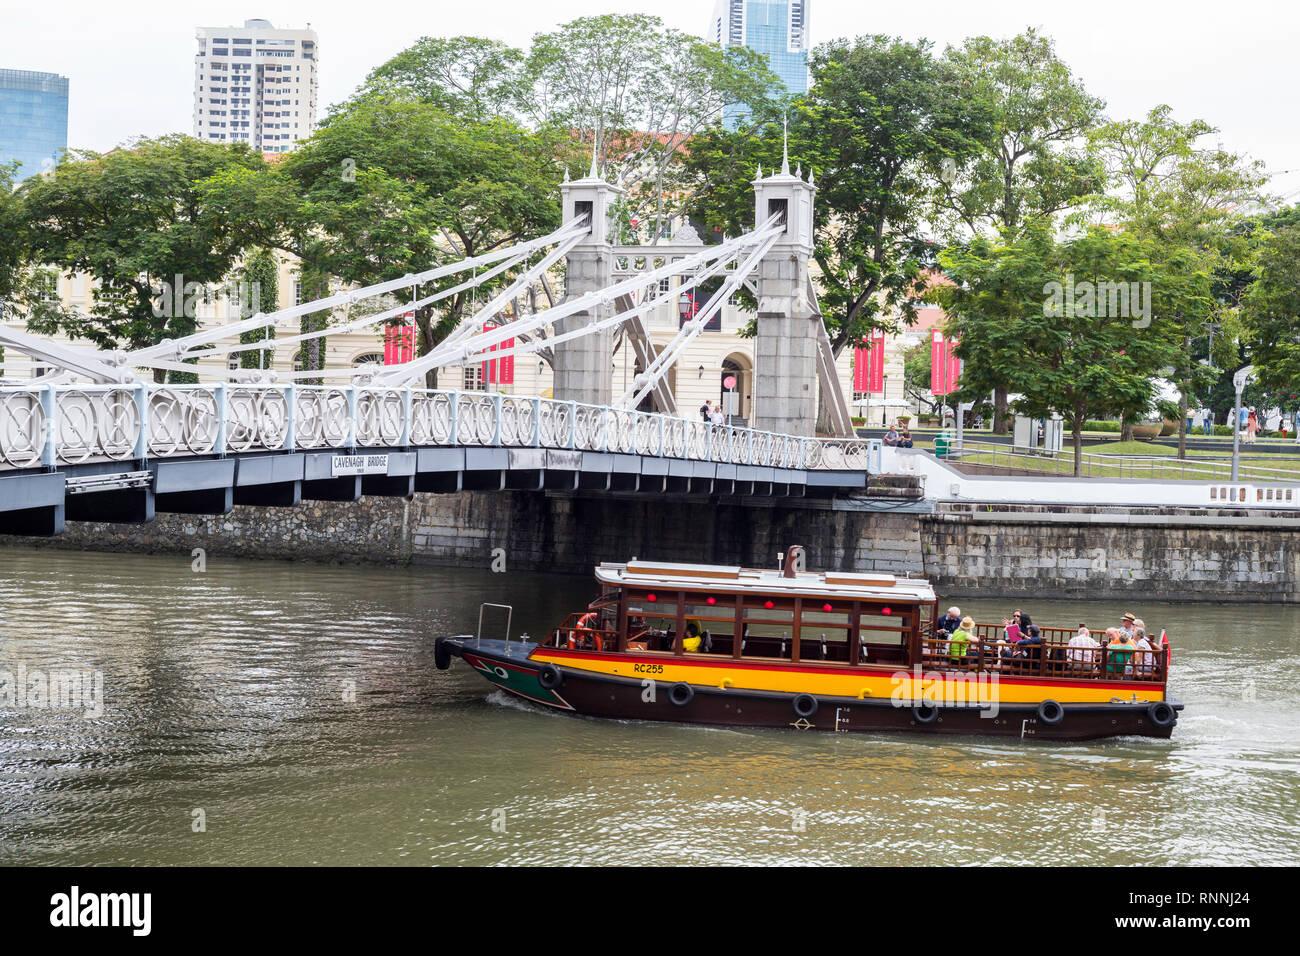 Cavenagh Bridge over Singapore River, 1870, Singapore. - Stock Image